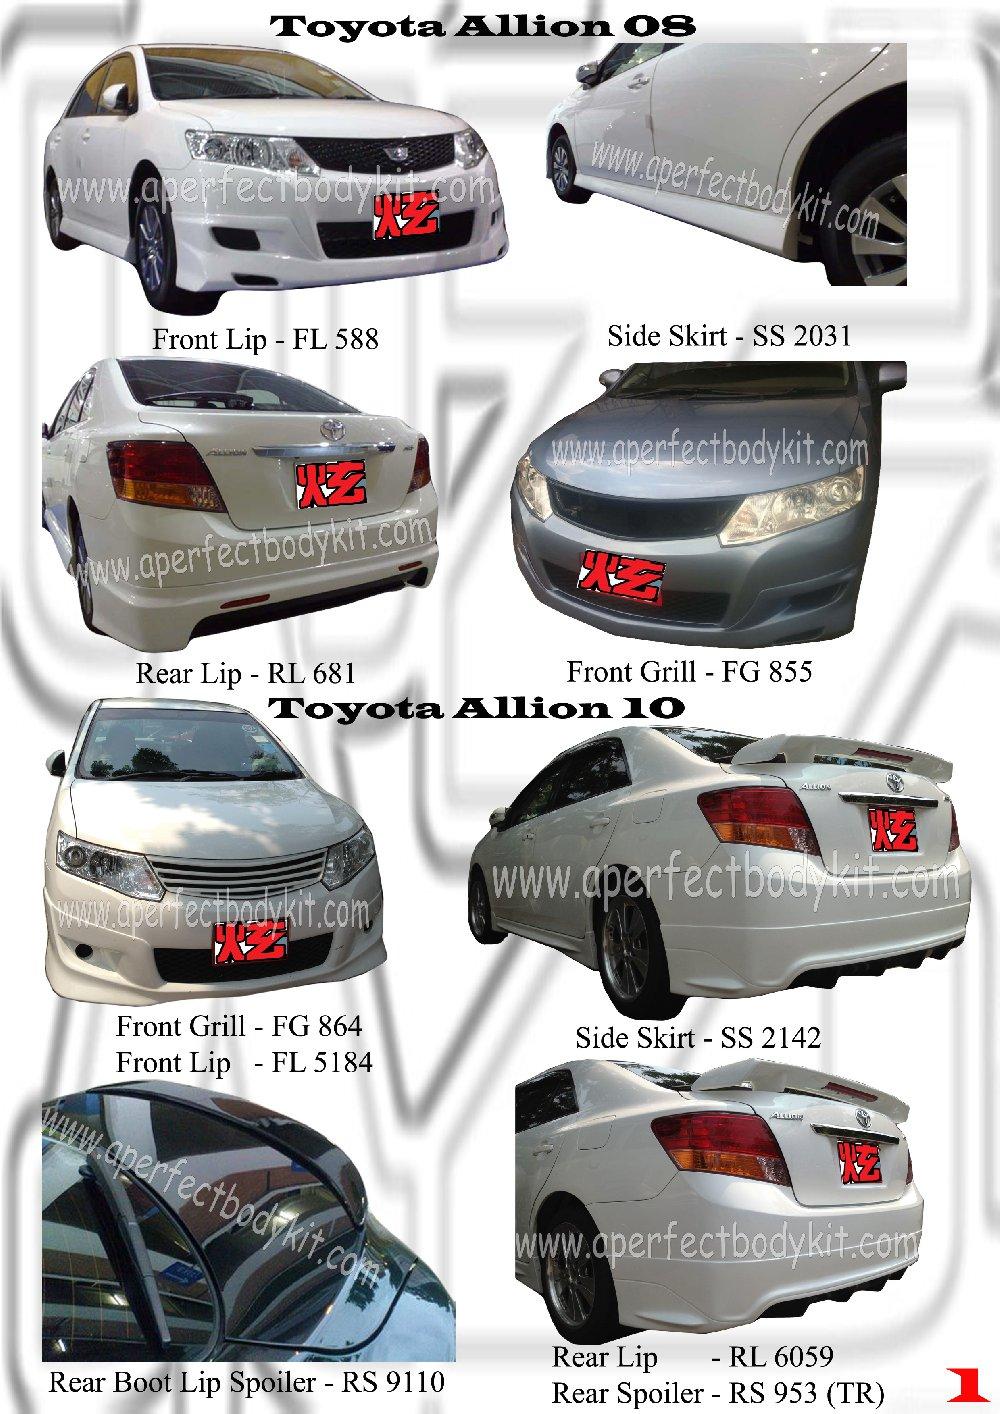 Toyota Allion 08 Amp 10 Toyota Allion Johor Bahru Jb